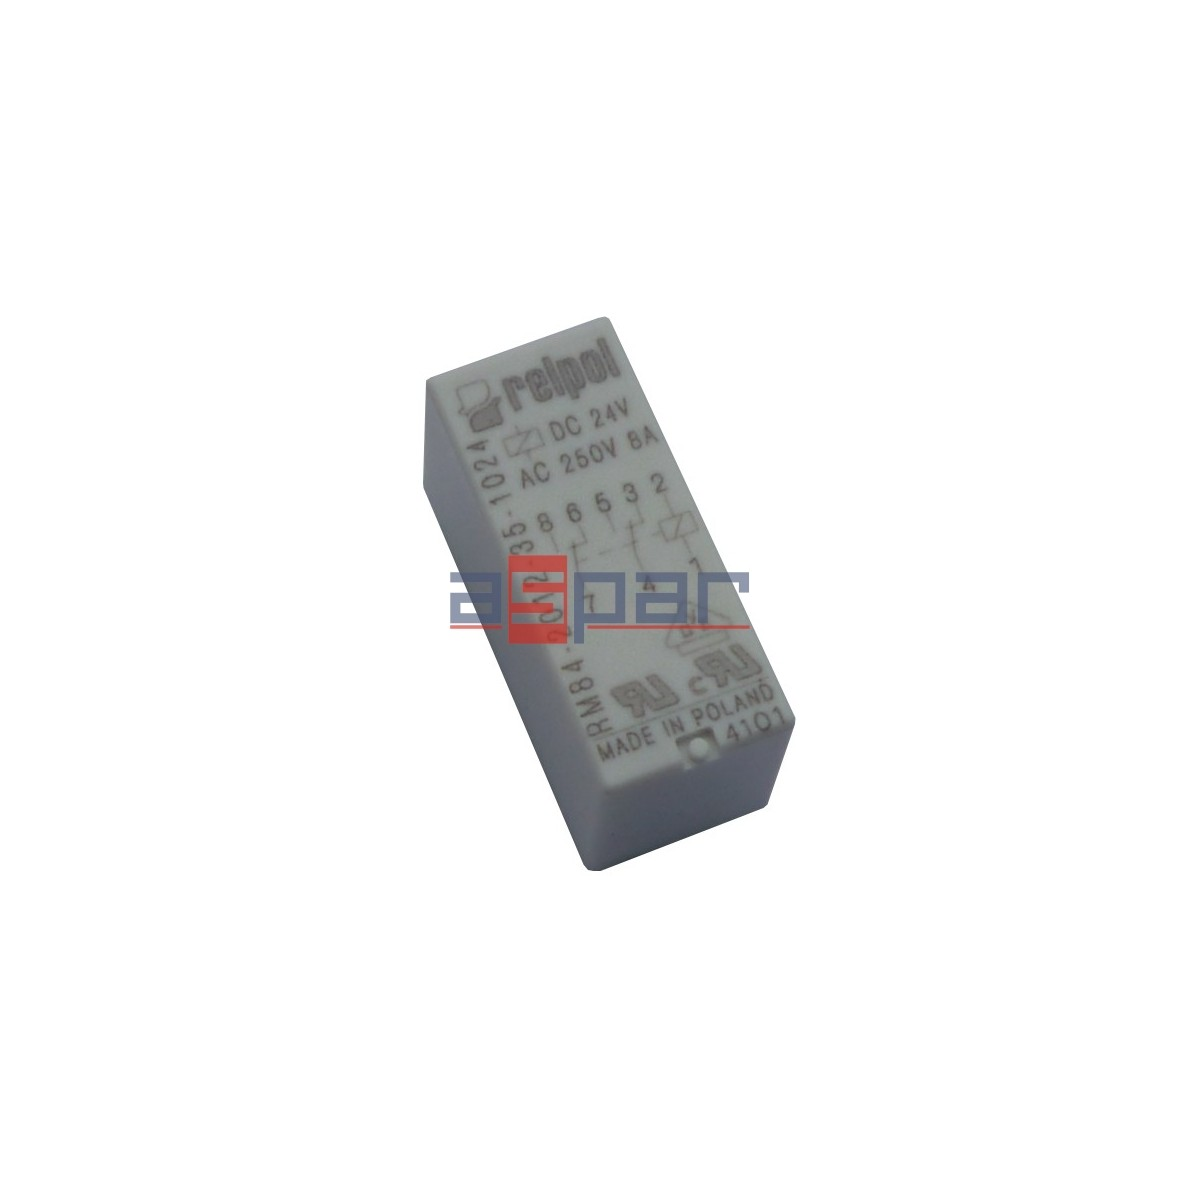 RM84-2012-35-1024